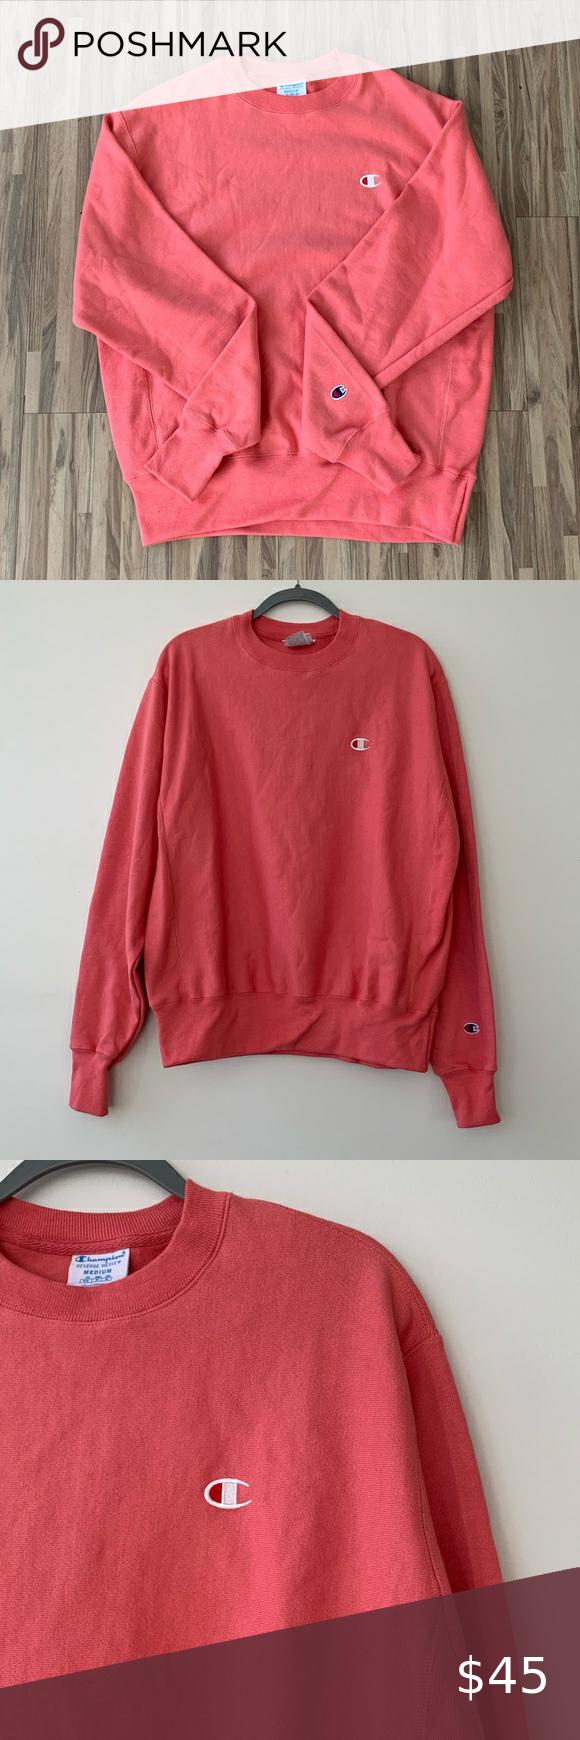 Champion Reverse Weave Crewneck Sweatshirt Champion Reverse Weave Crew Neck Sweatshirt Clothes Design [ 1740 x 580 Pixel ]